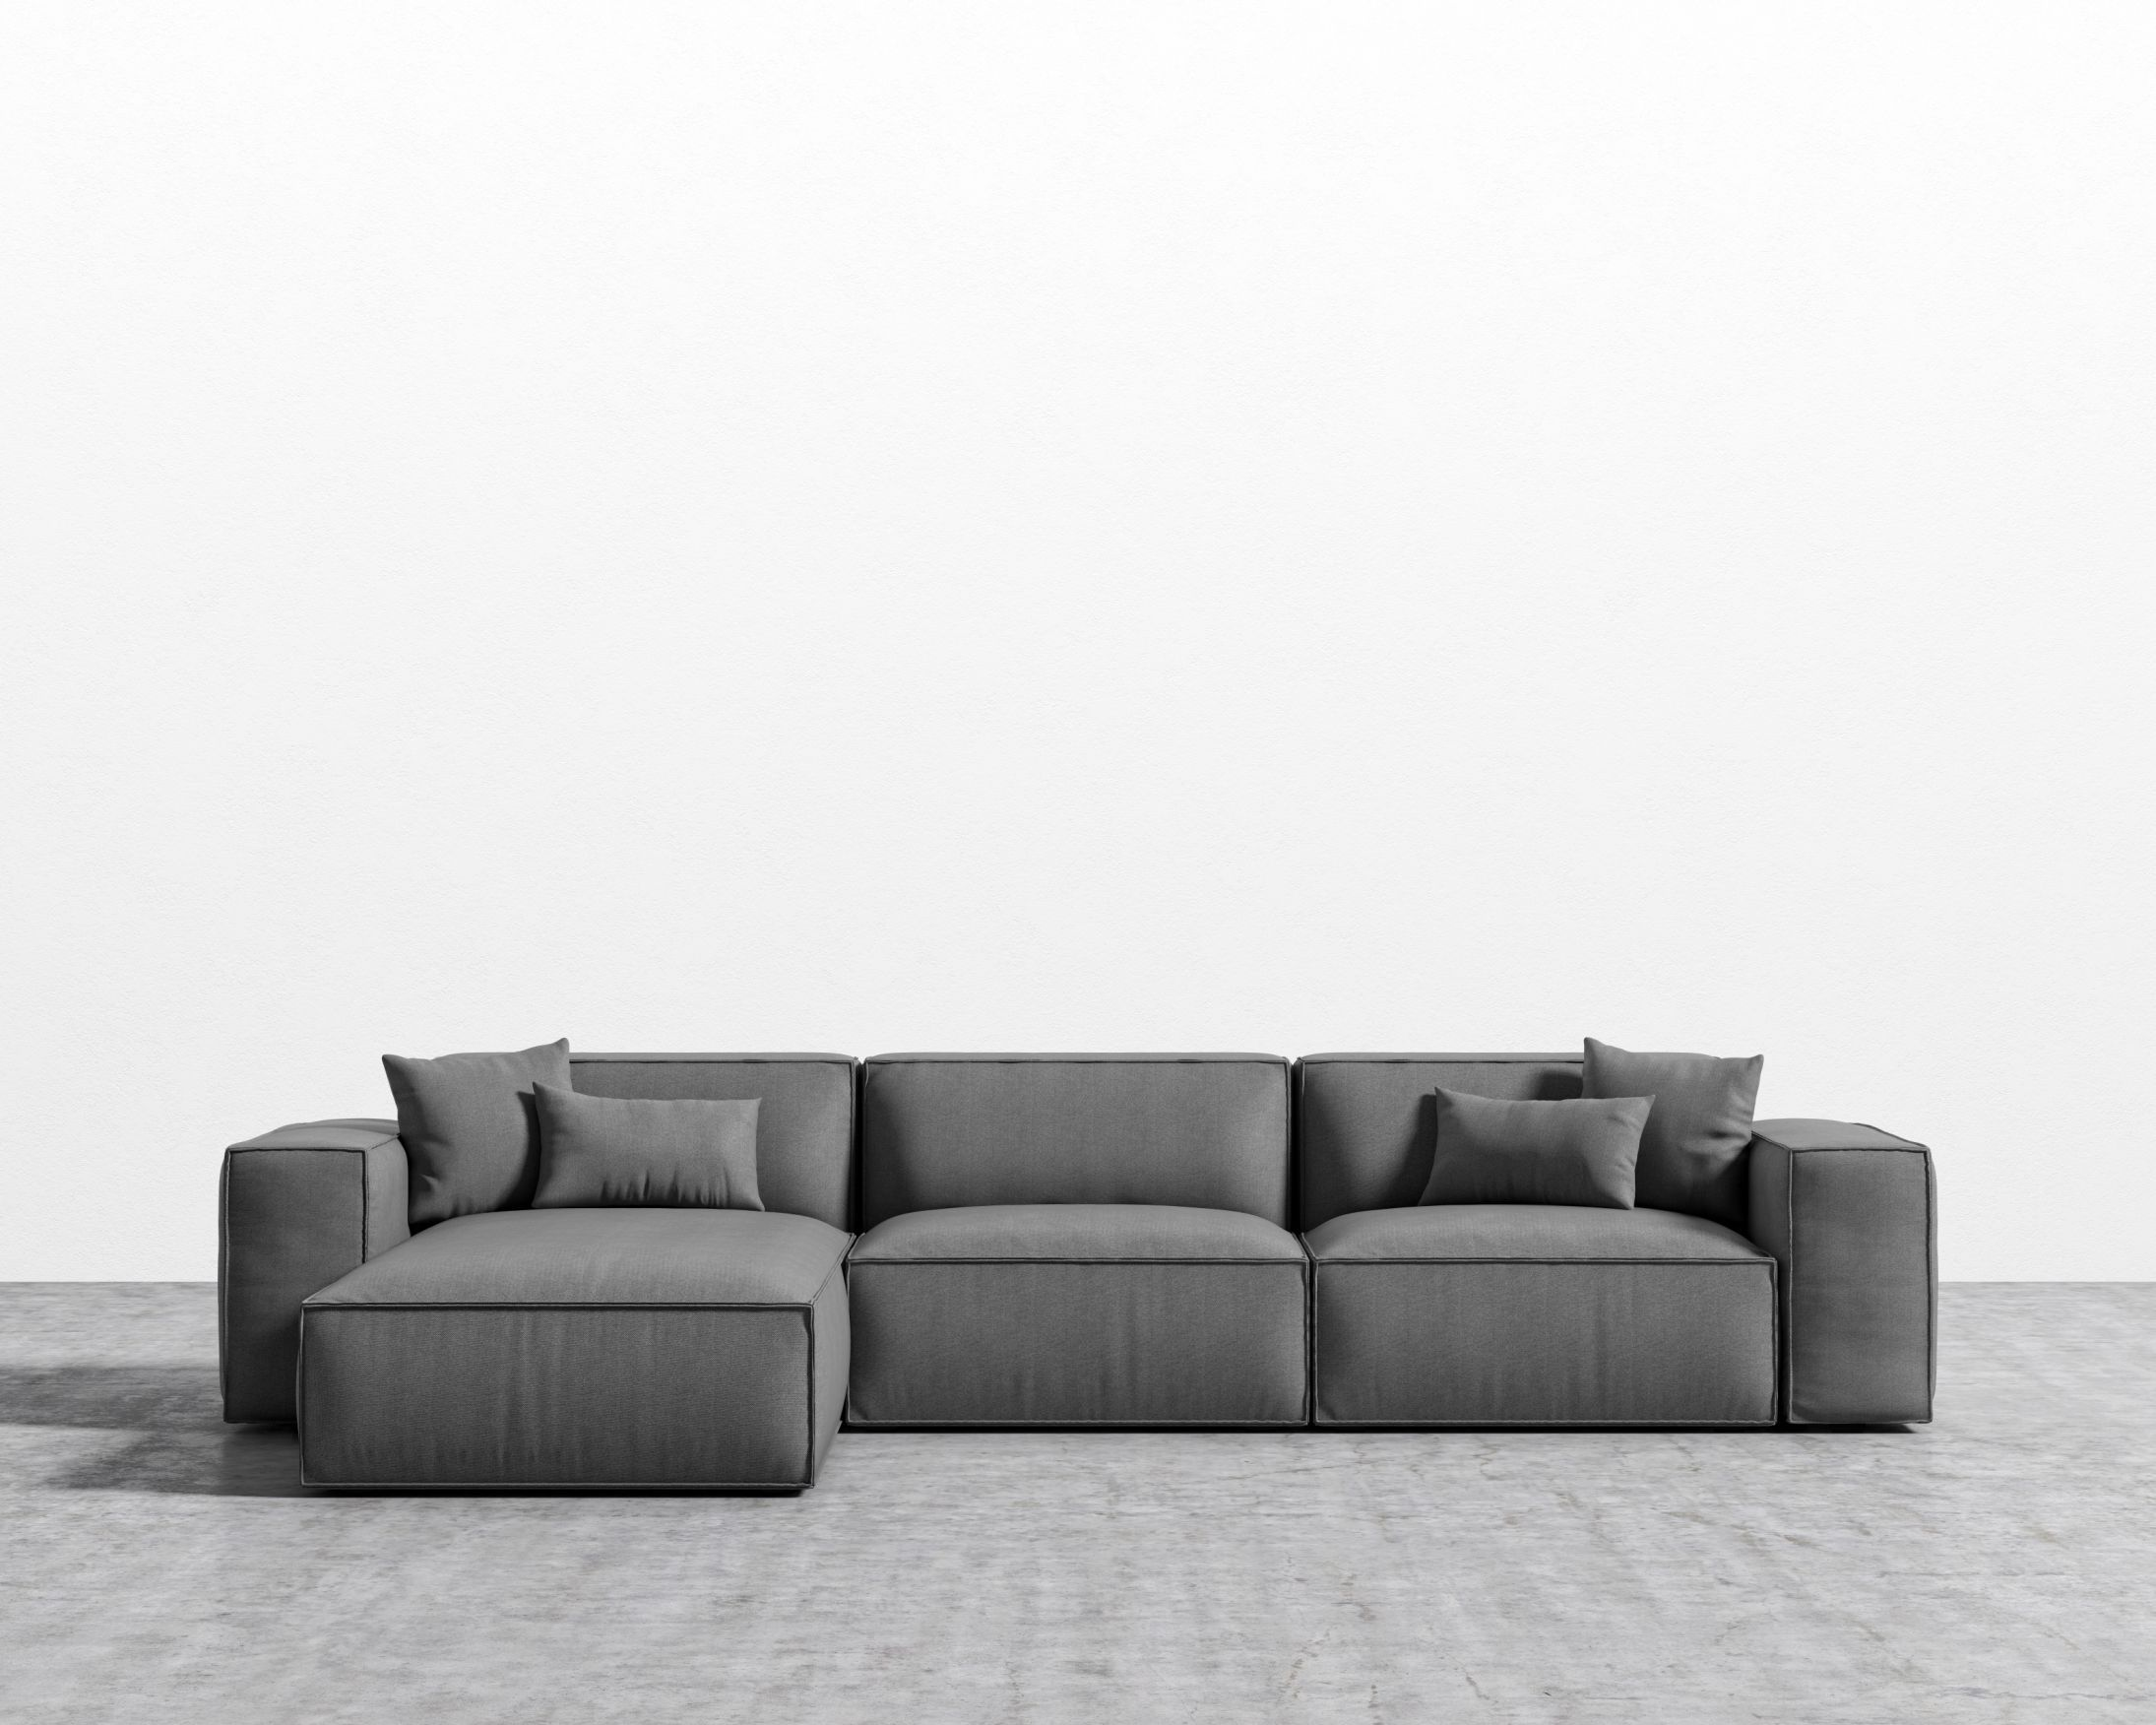 Porter Sectional Sectional Low Sofa Sofa